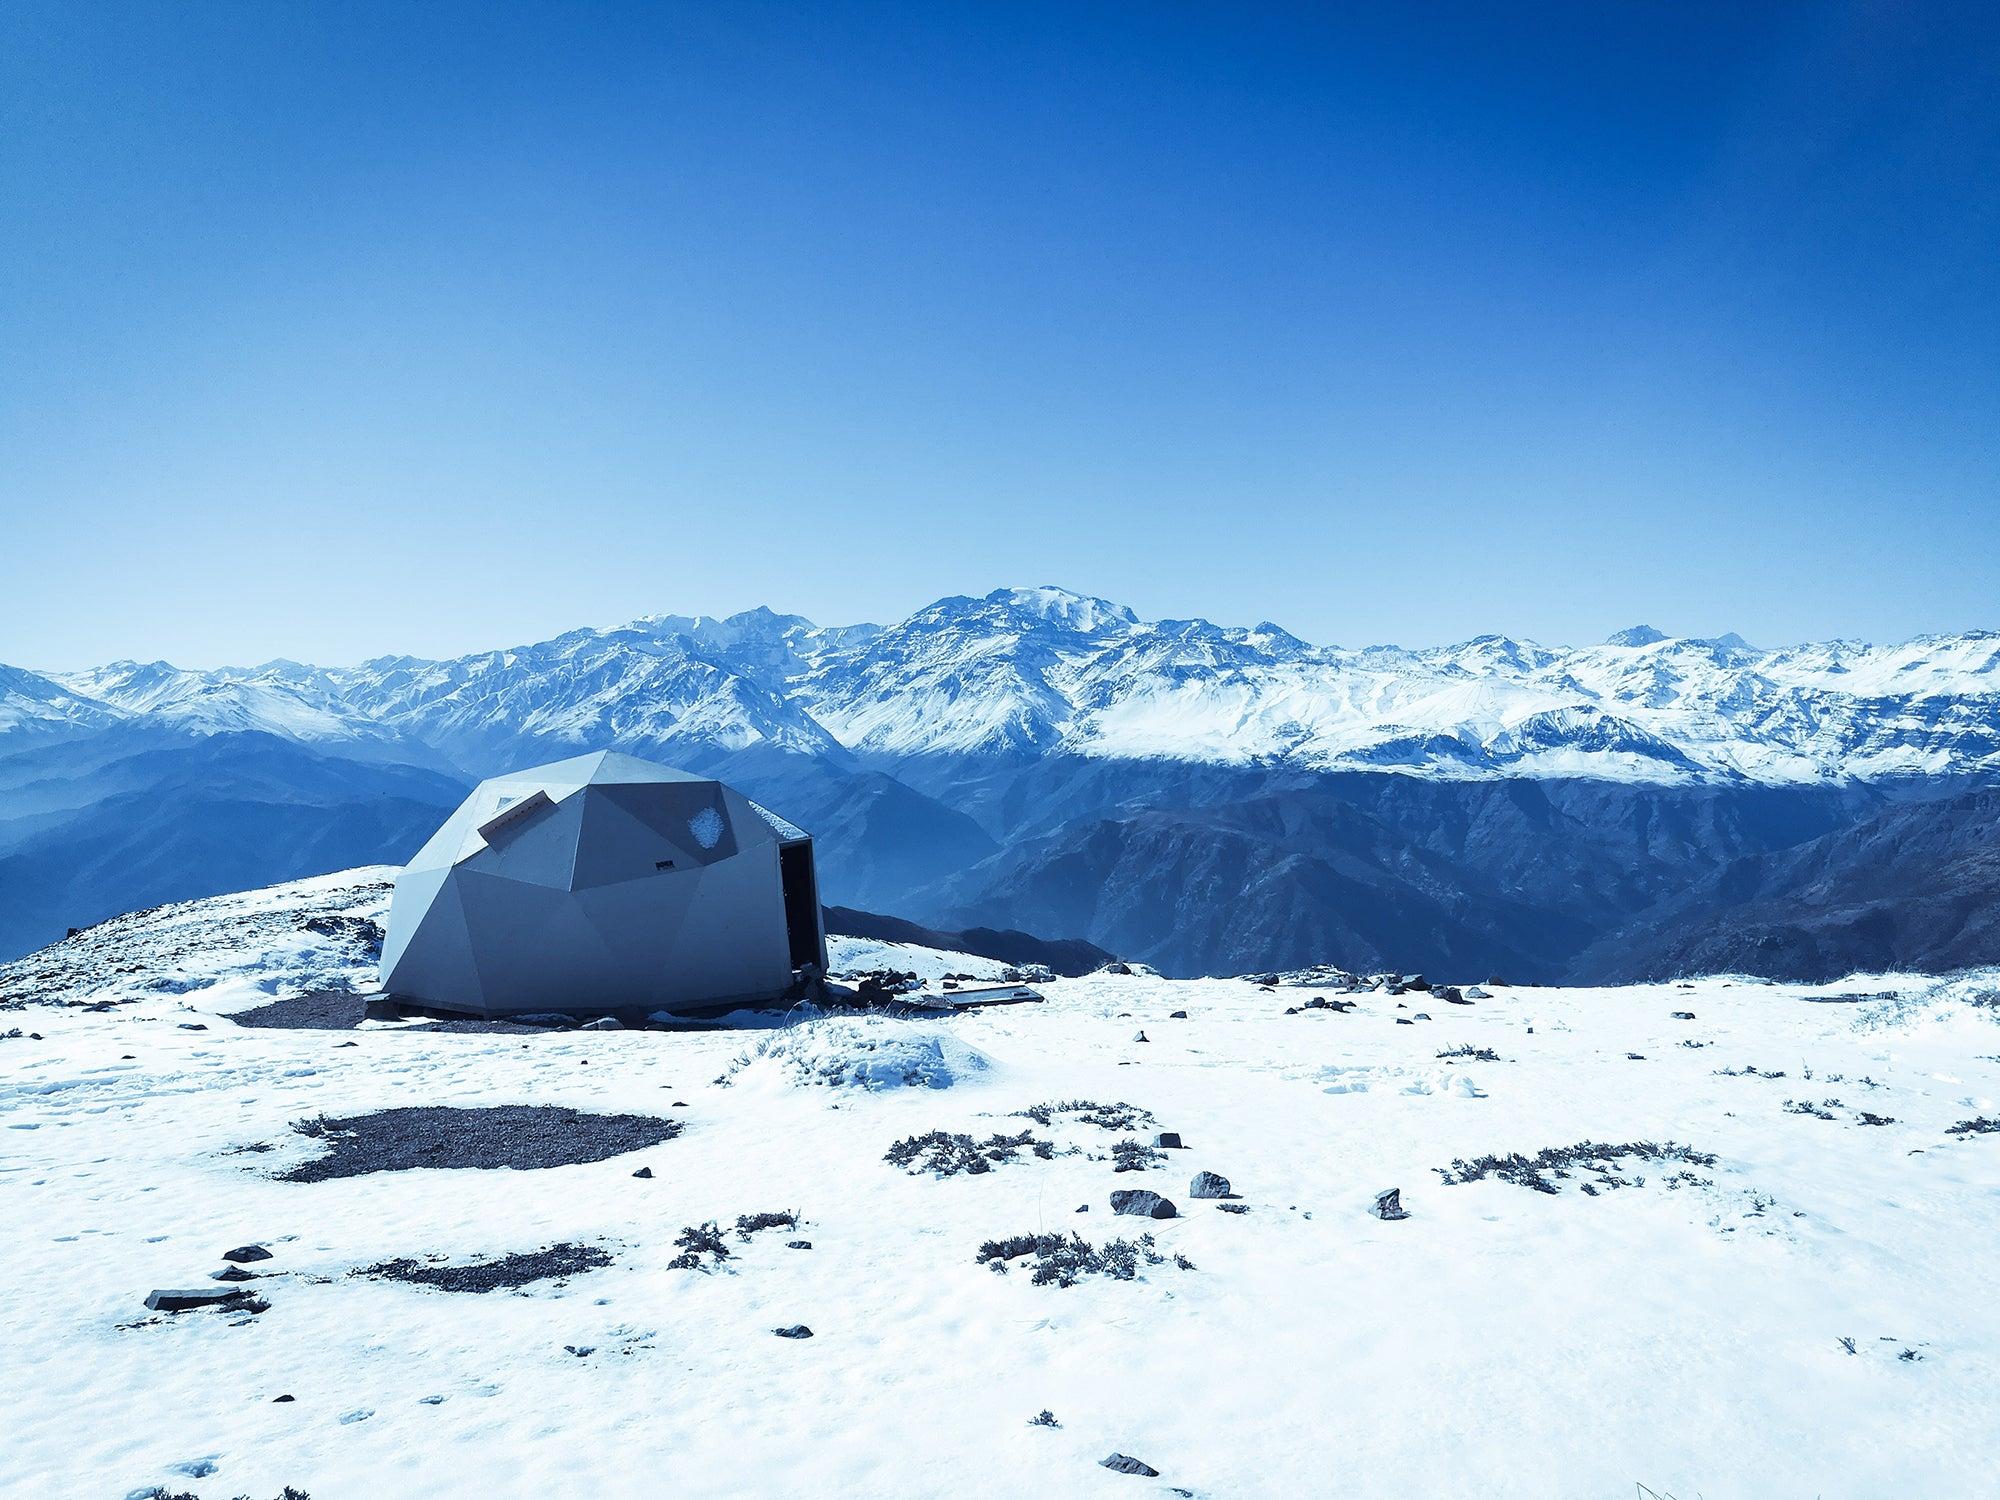 white tent on a snowy mountain